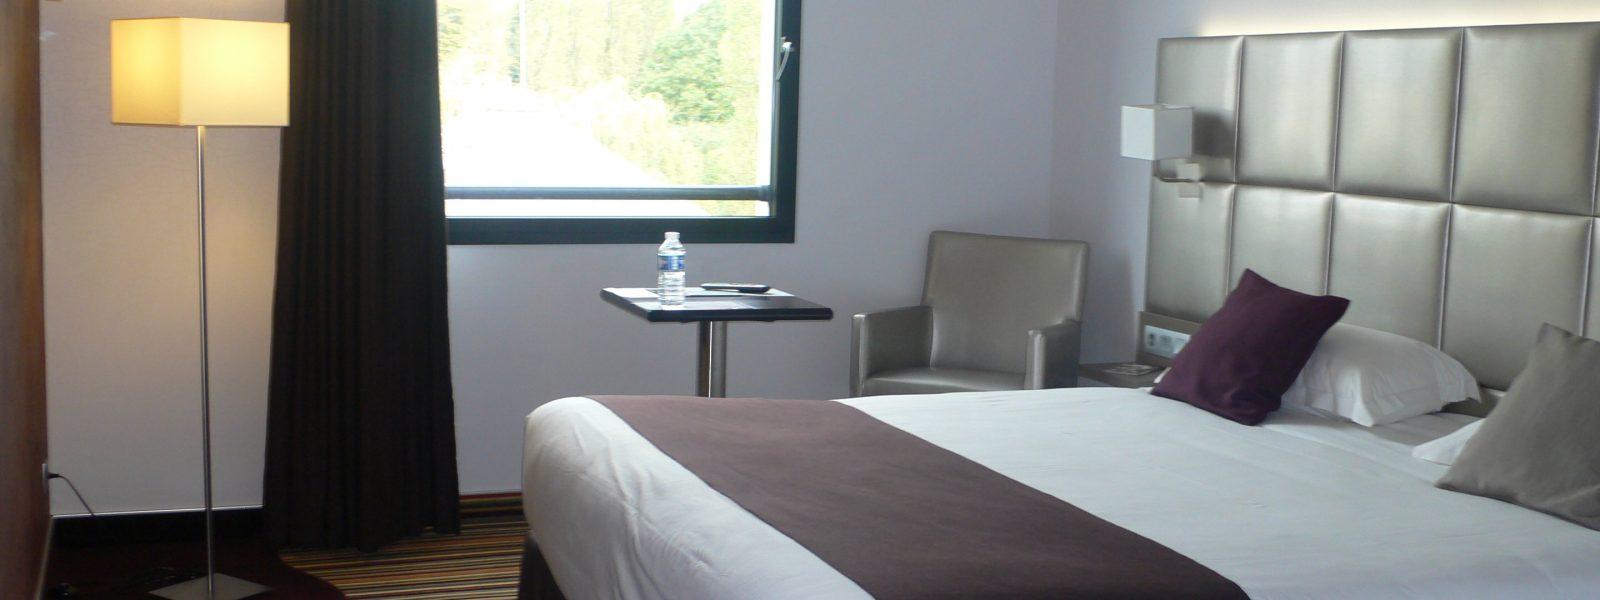 Brit hotel - Rennes Atalante Beaulieu